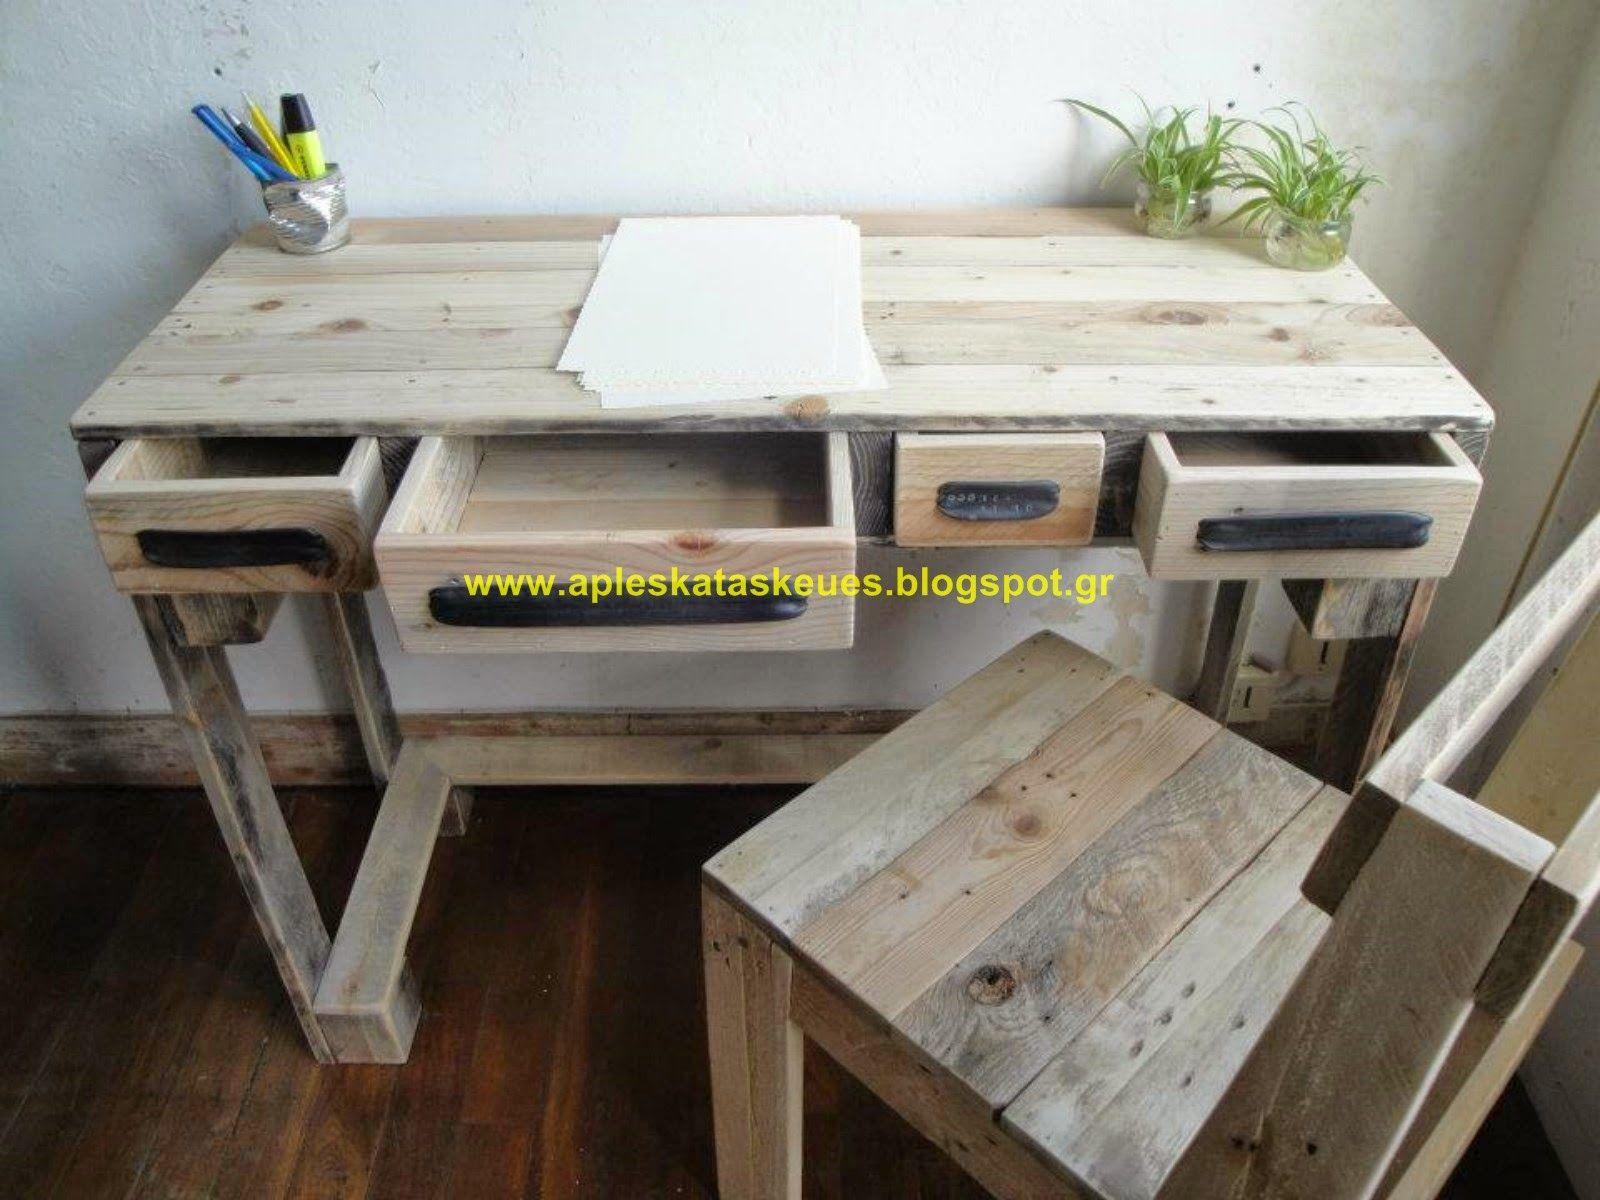 24c810b0c310 Απλές κατασκευές από παλέτες   Simple Pallet Construction  Γραφεία από  παλέτες (pallet desk)